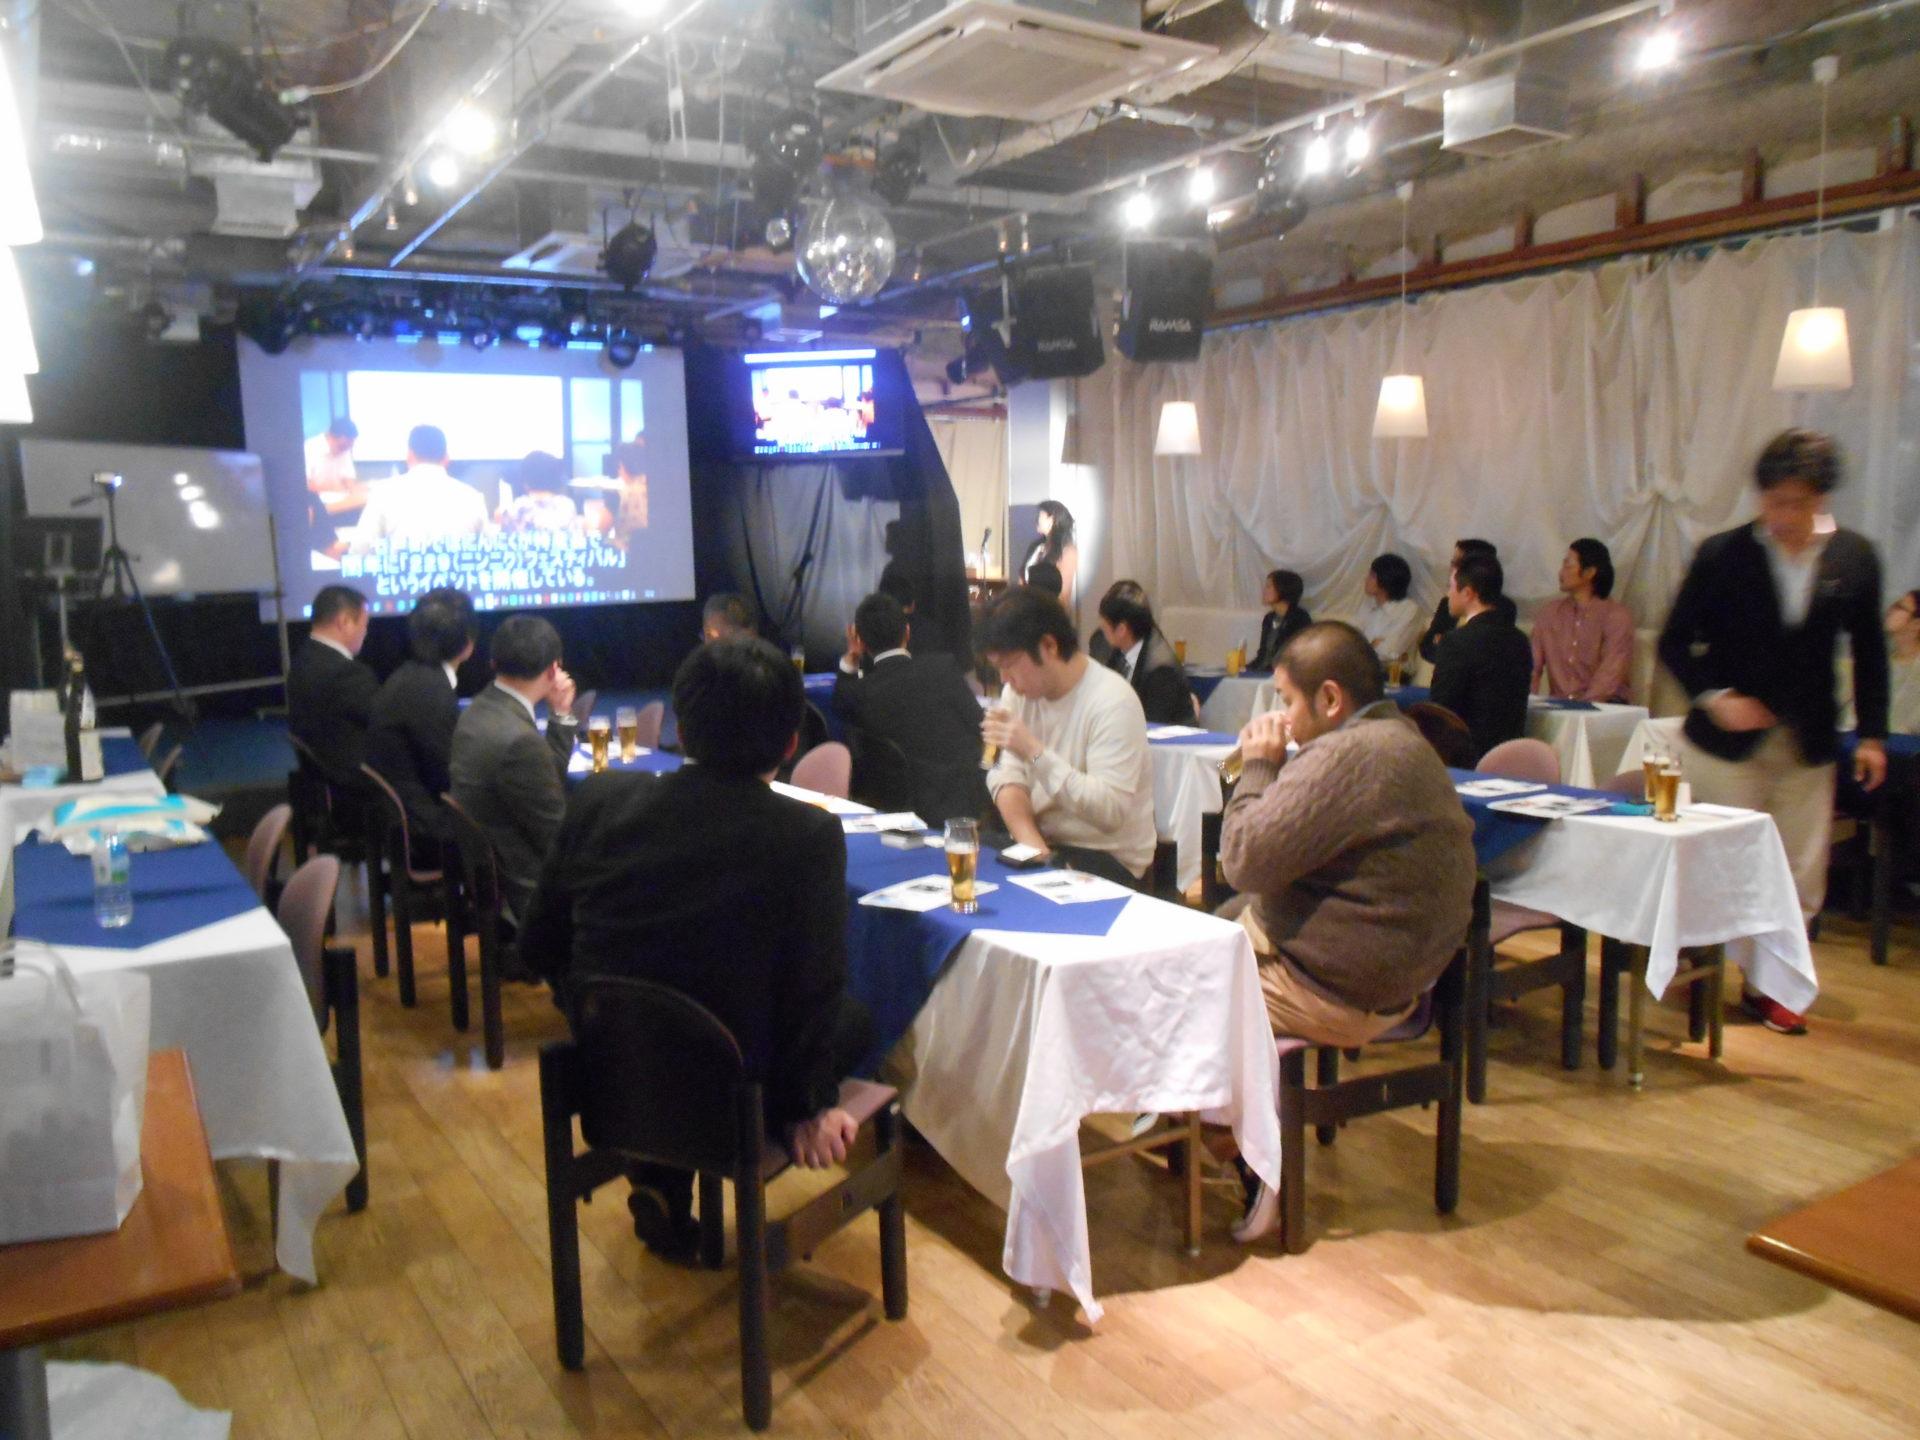 DSCN1023 1920x1440 - 2016年3月11日(金)AOsuki総会&パーティー開催しました。